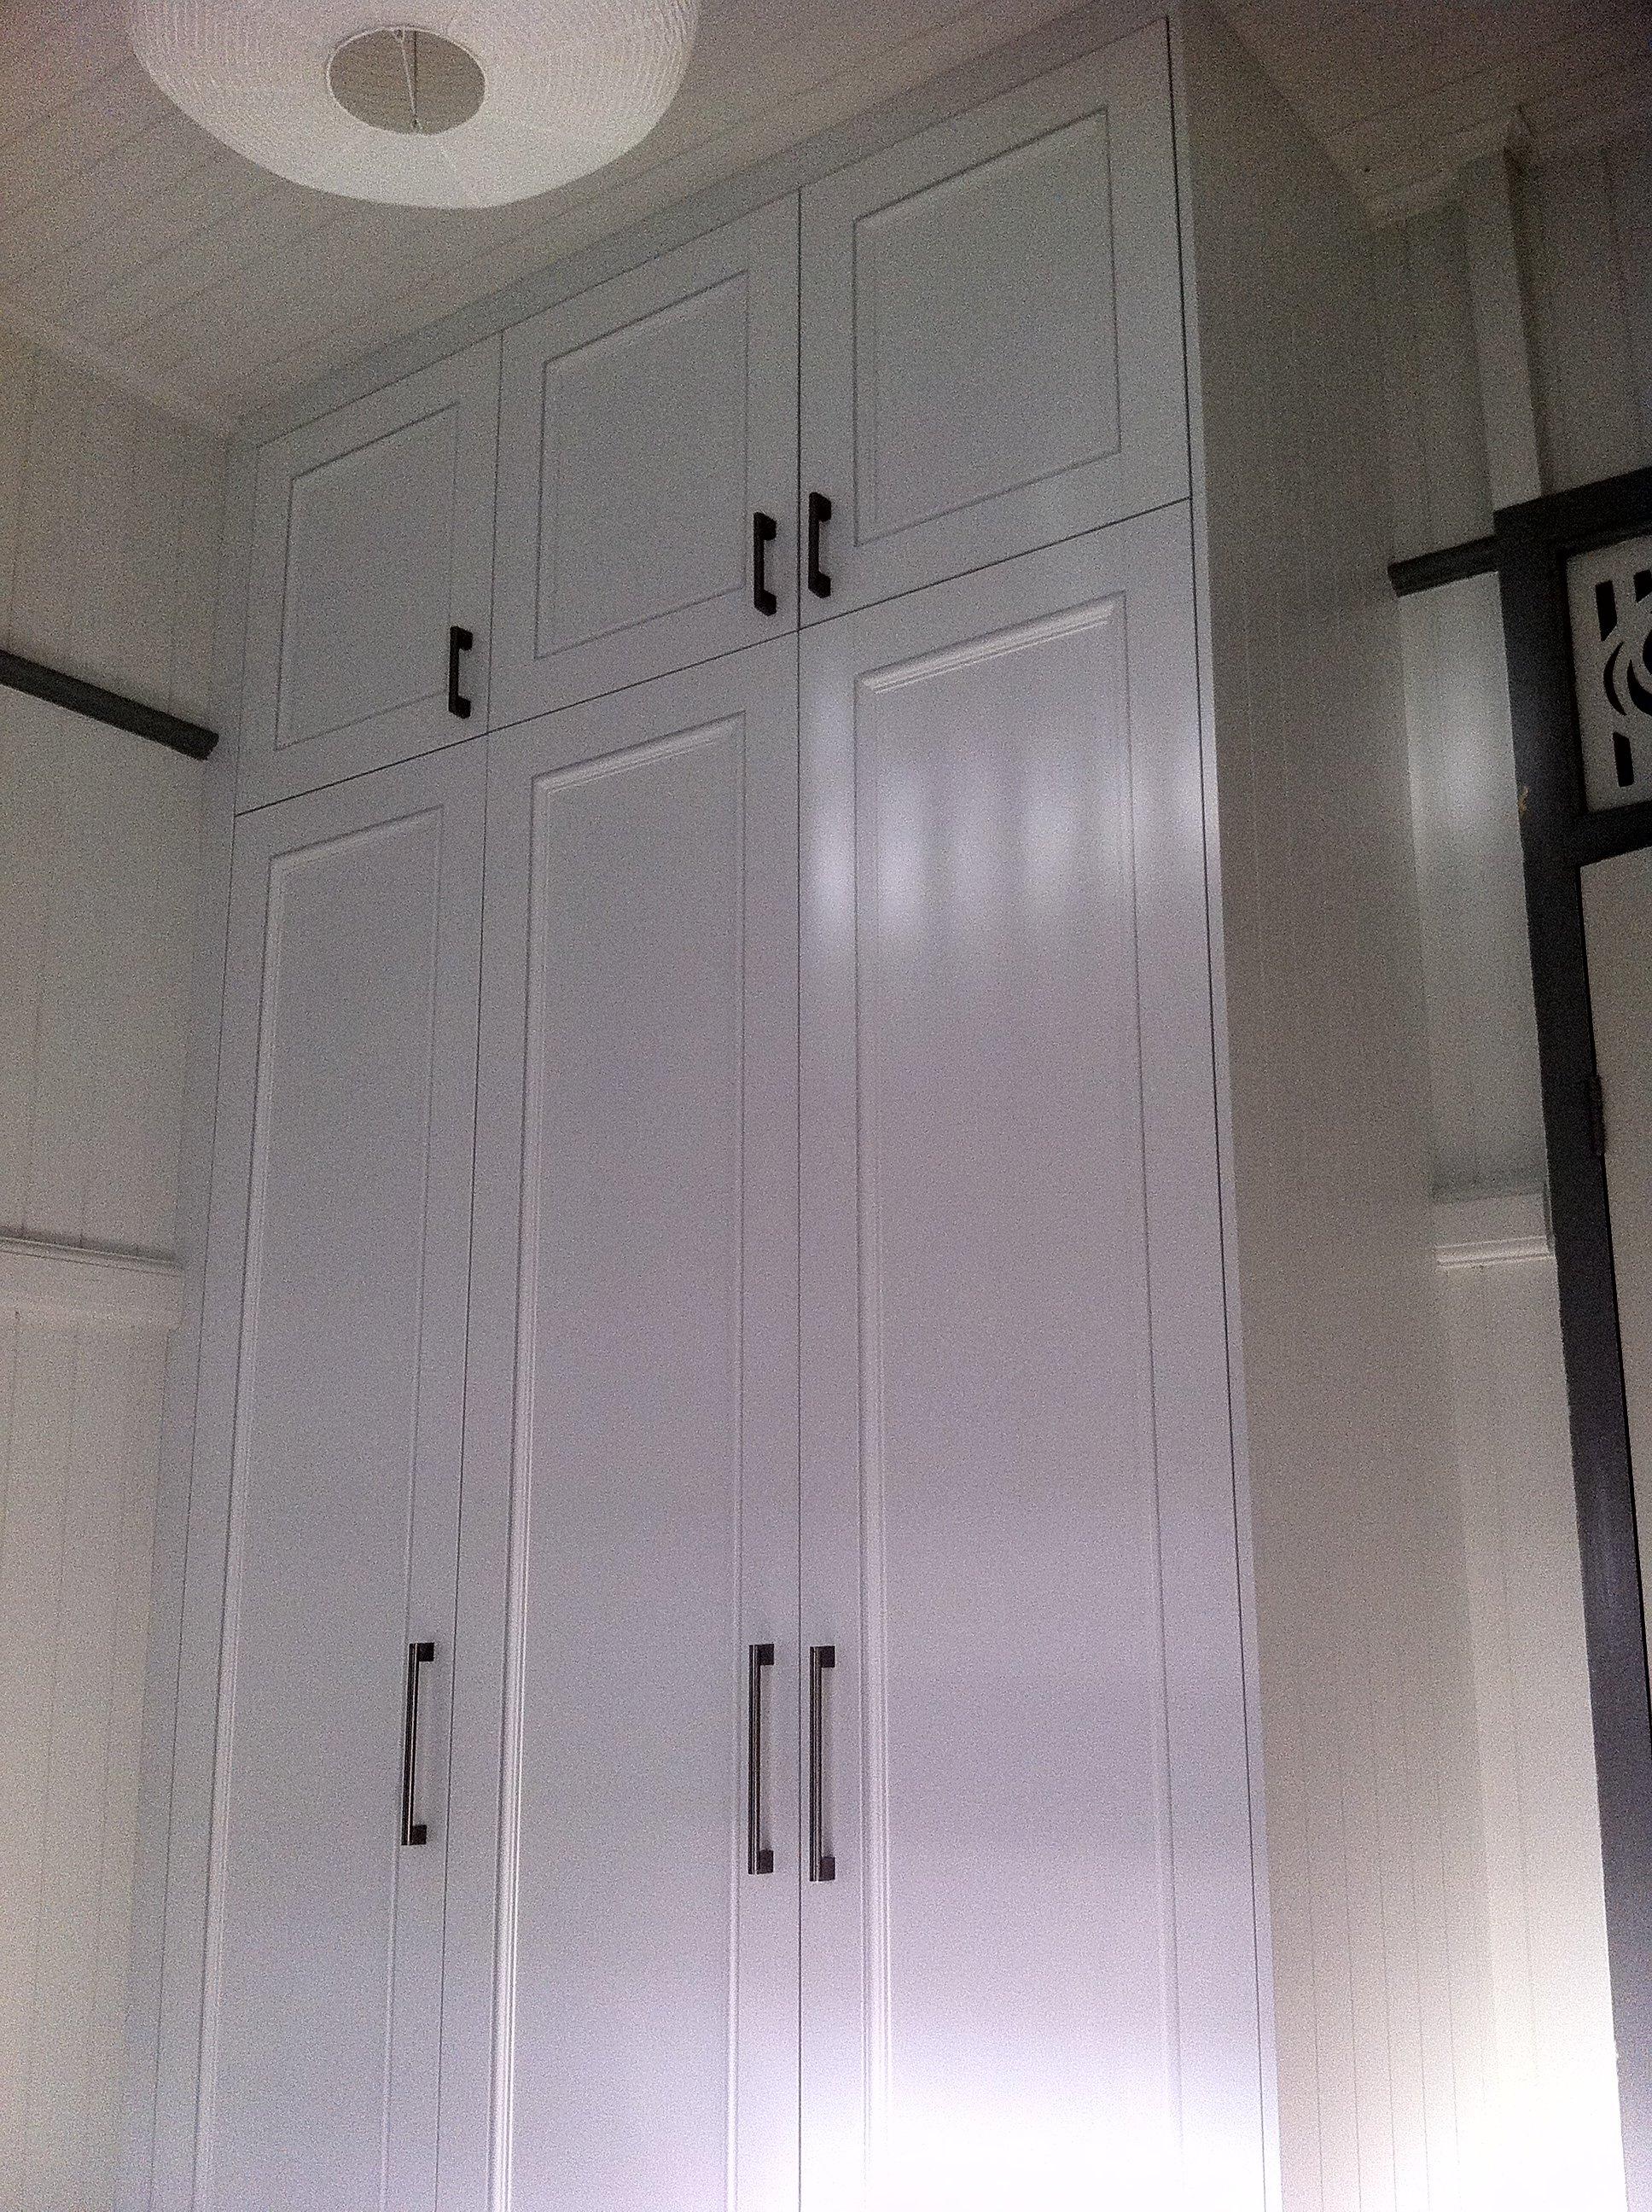 Doors designed for high ceilings